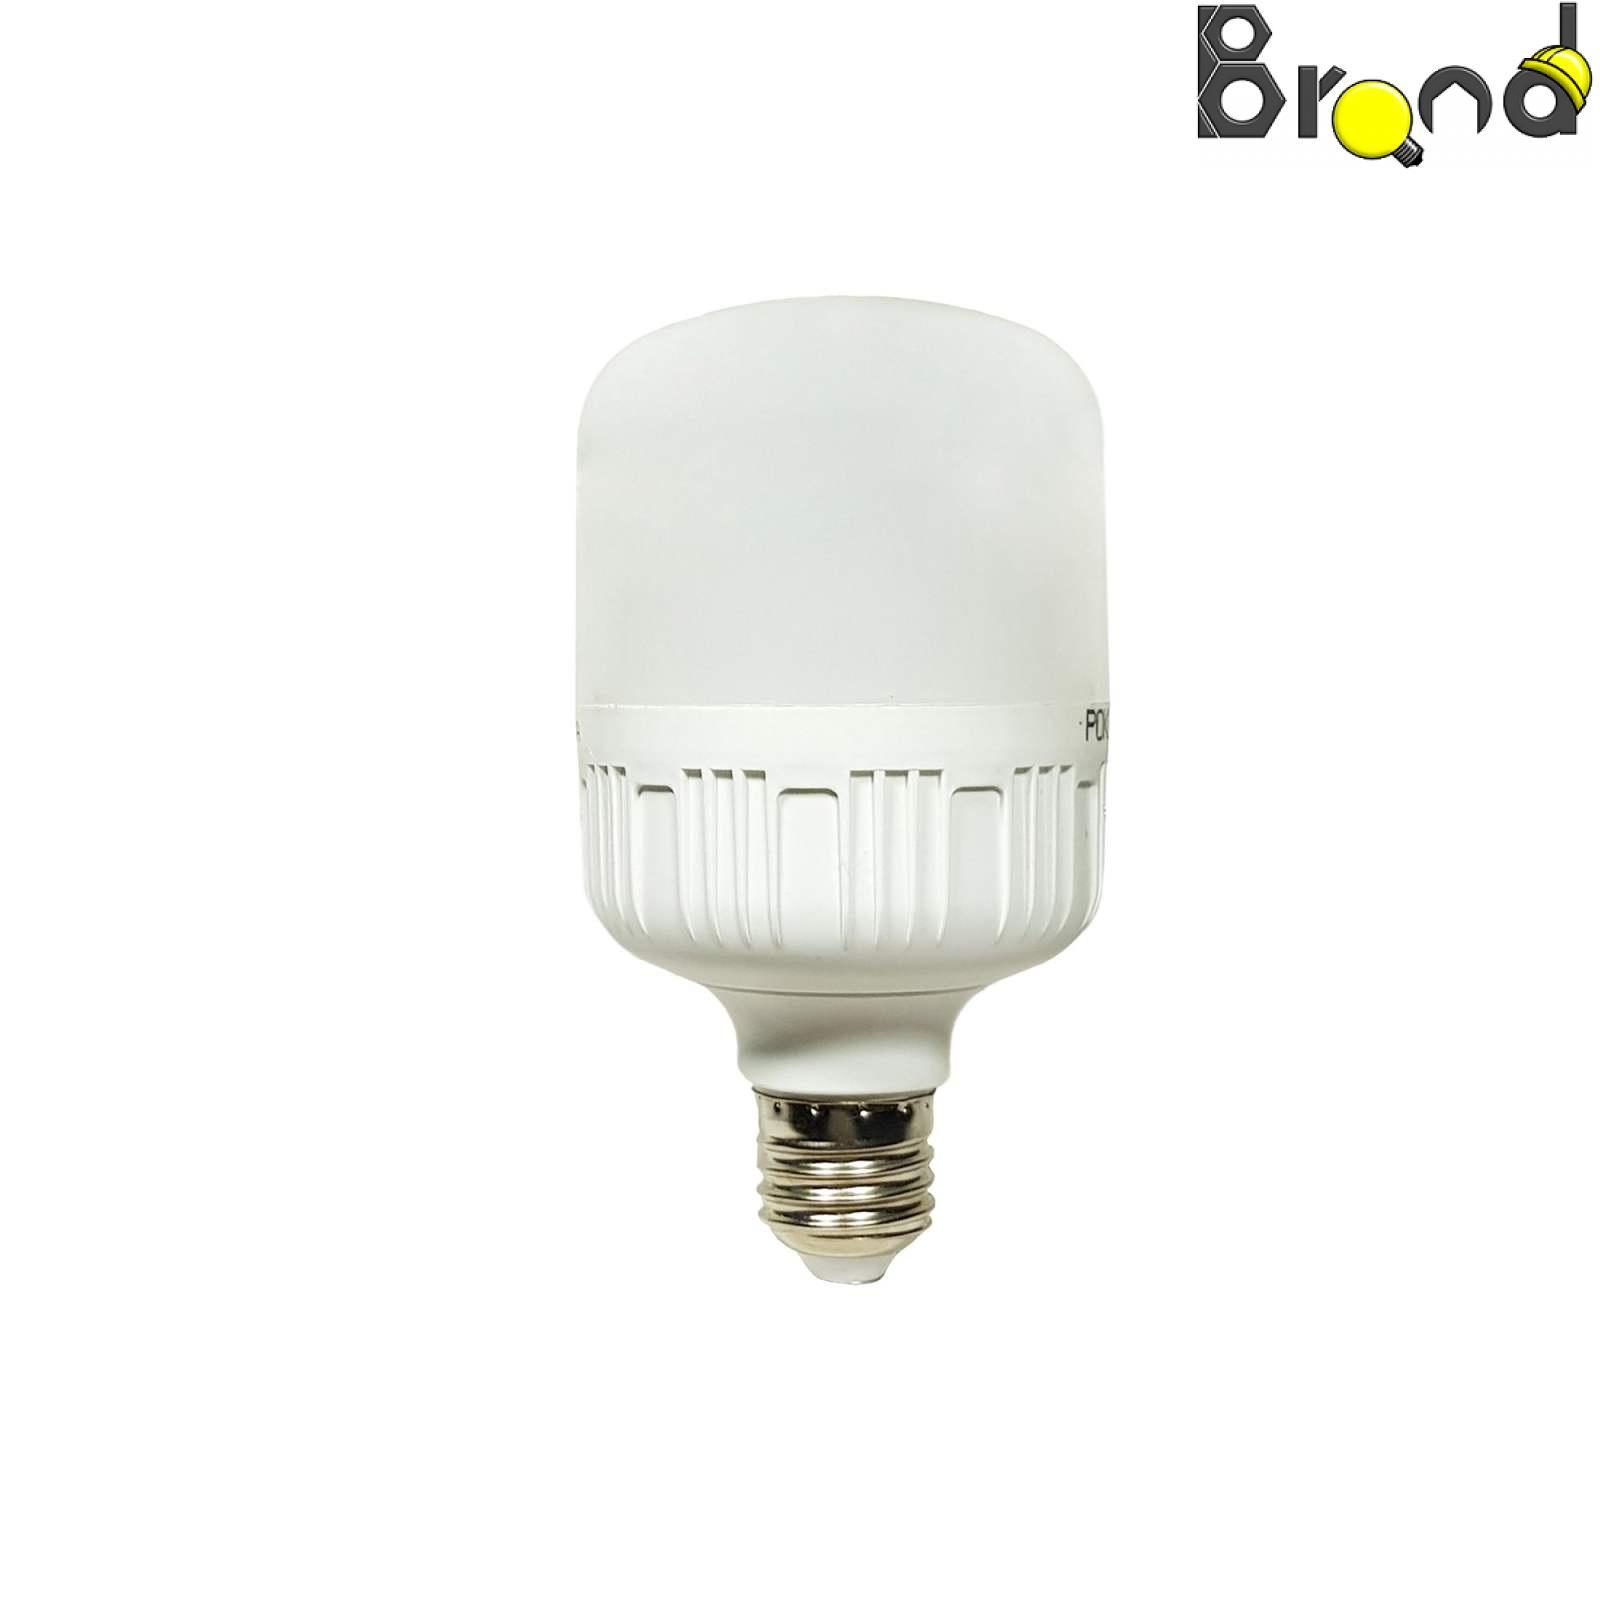 لامپ ال ای دی 50 وات پوکلا مدل SH_5005